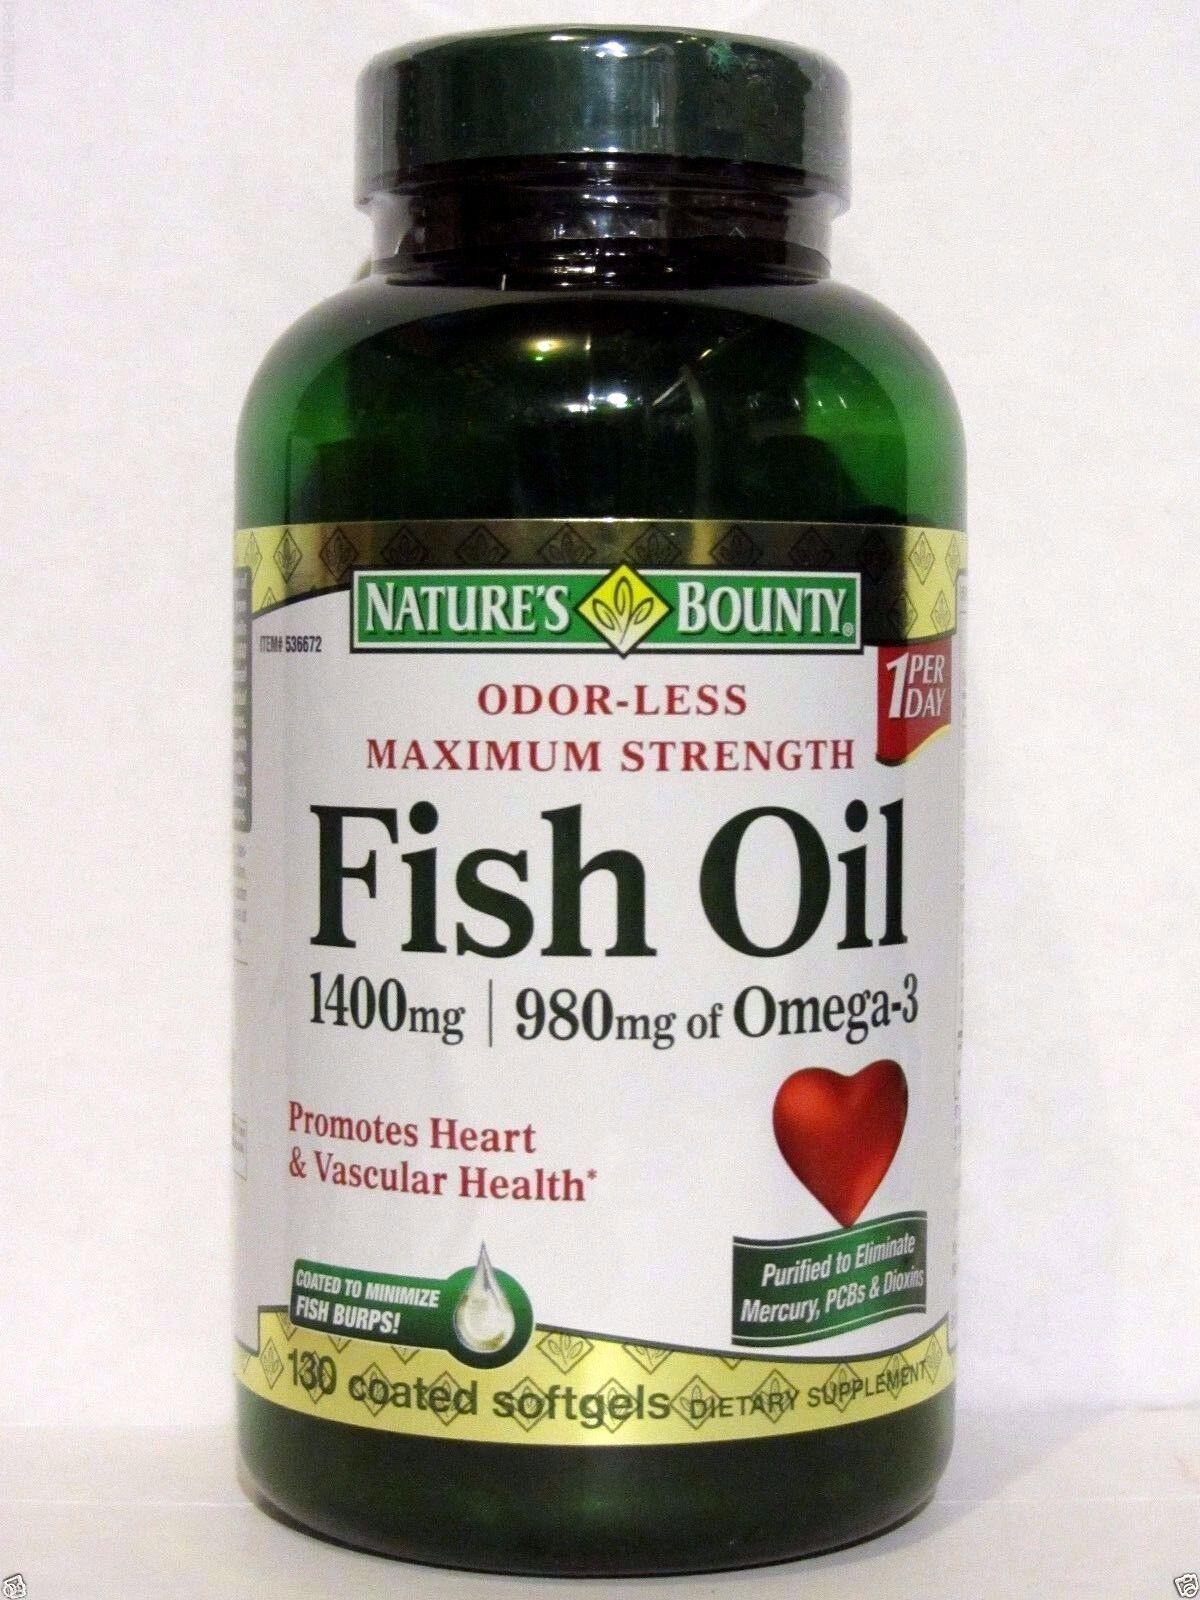 Nature's Bounty Maximum Strength Fish oil 1400mg, 980mg of